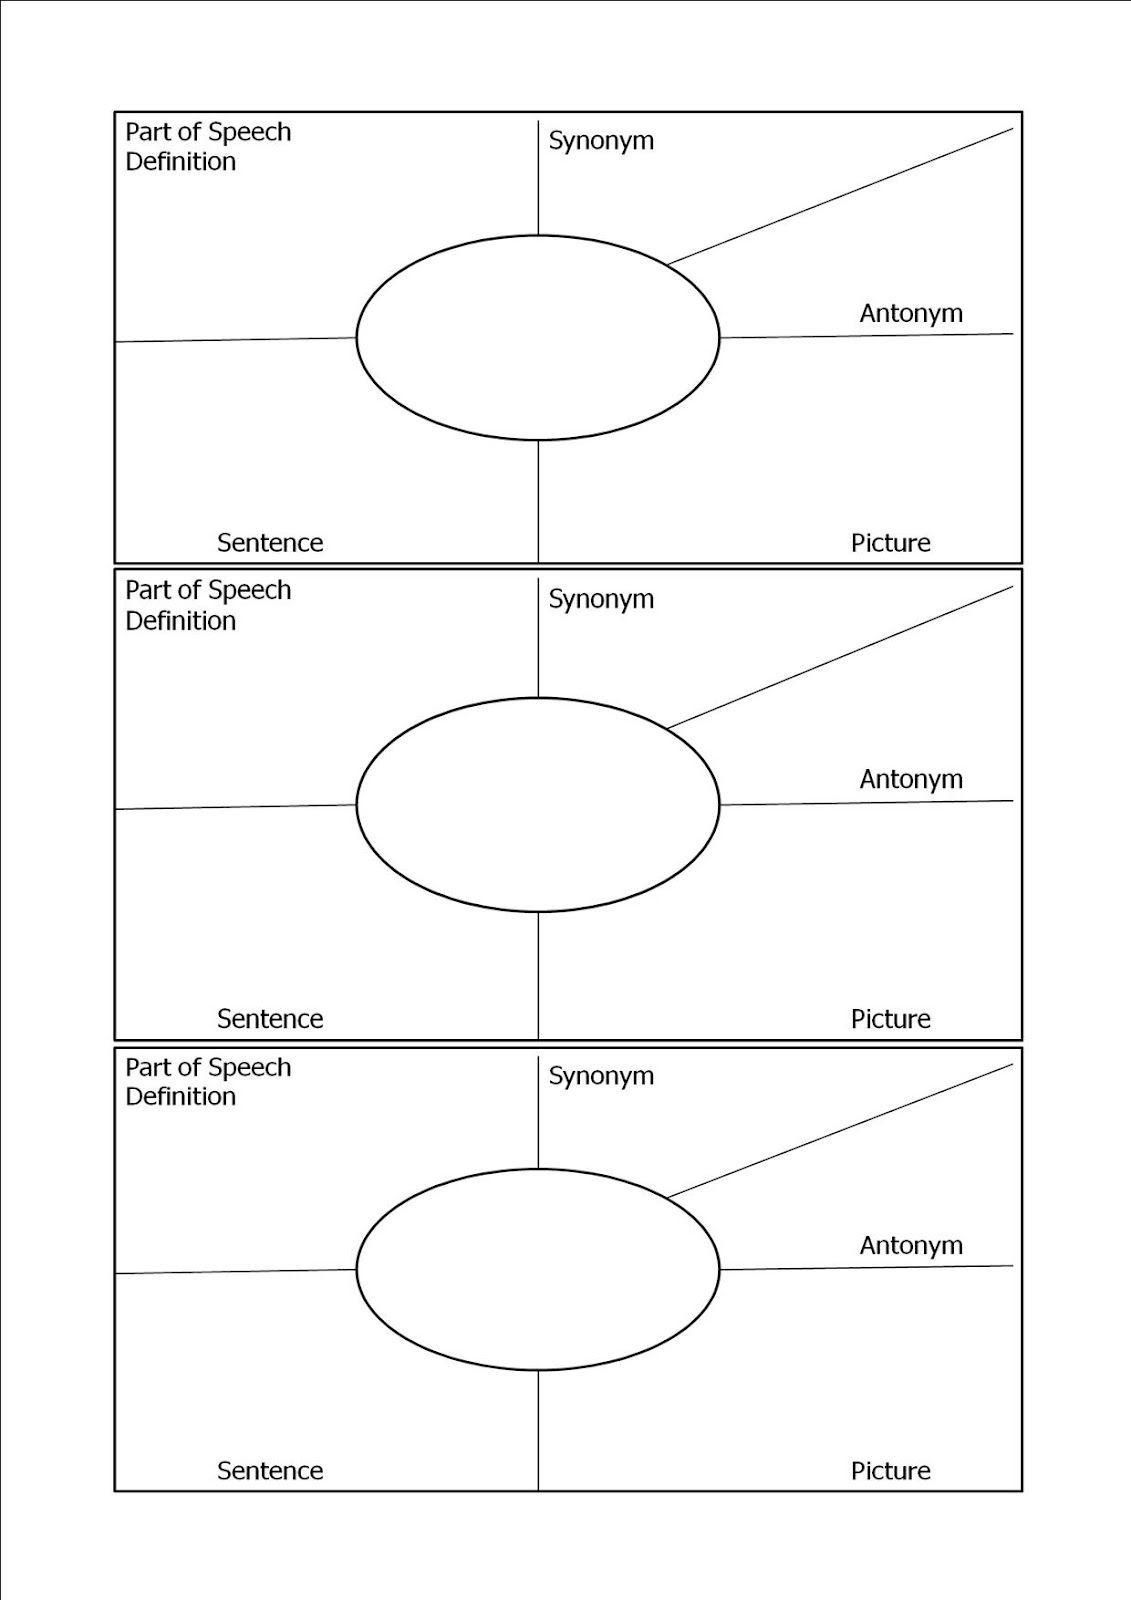 The Marvelous Kinsella Vocabulary Template Printable Vocabulary Chart Regarding Vocabulary Words Vocabulary Word Worksheet Vocabulary Words Writing Templates [ 1600 x 1131 Pixel ]